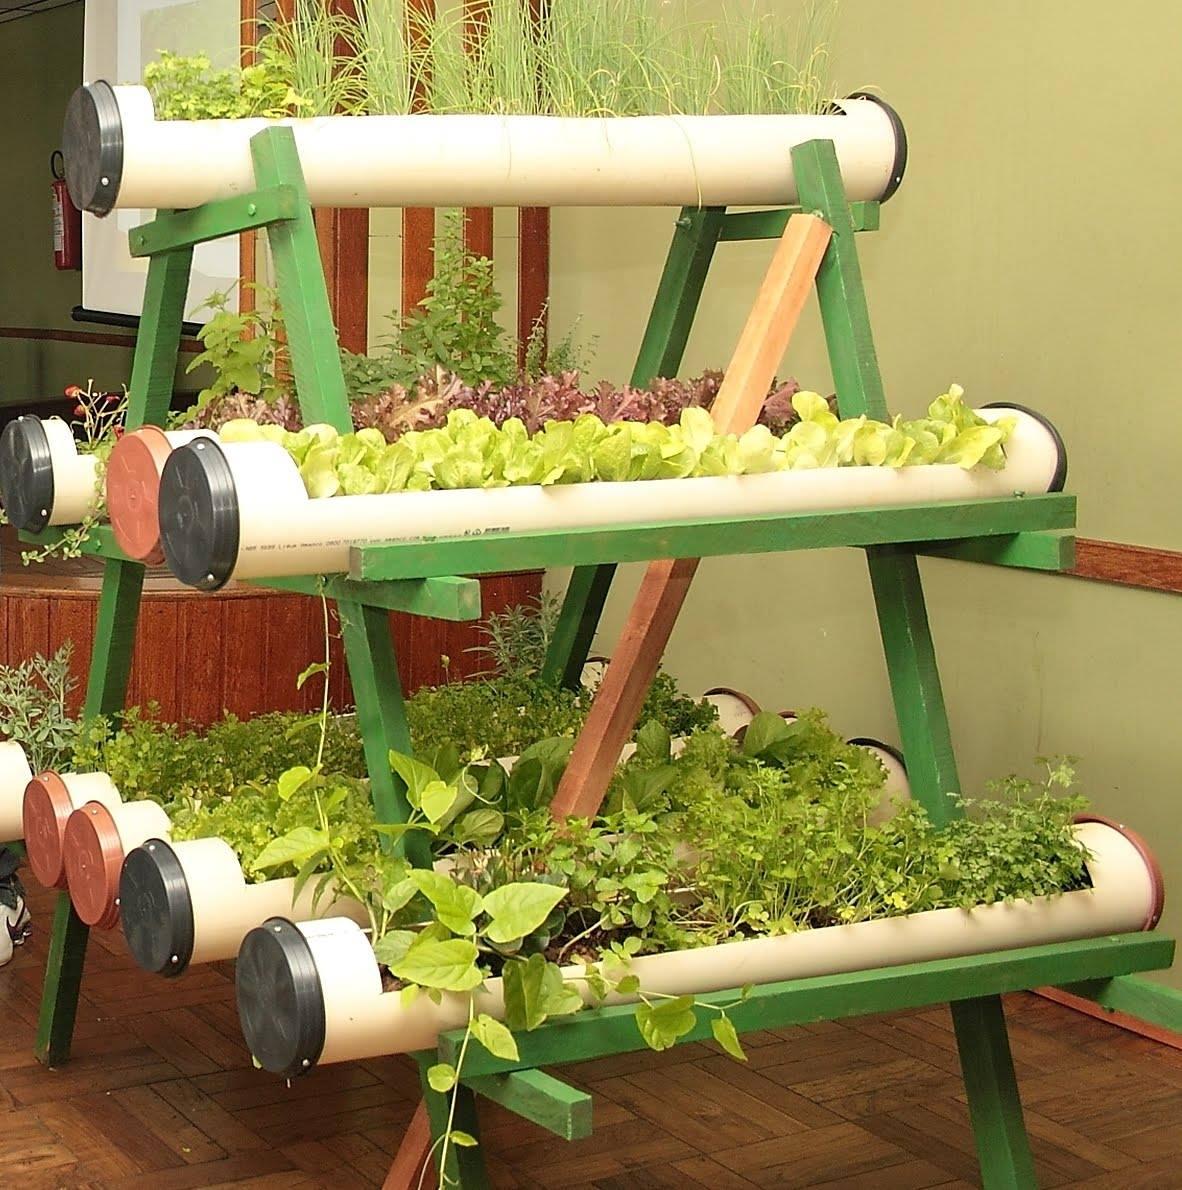 Decoracion Zen Barata ~ Dise?a tu propio jardin de hortalizas (15)  Curso de Organizacion